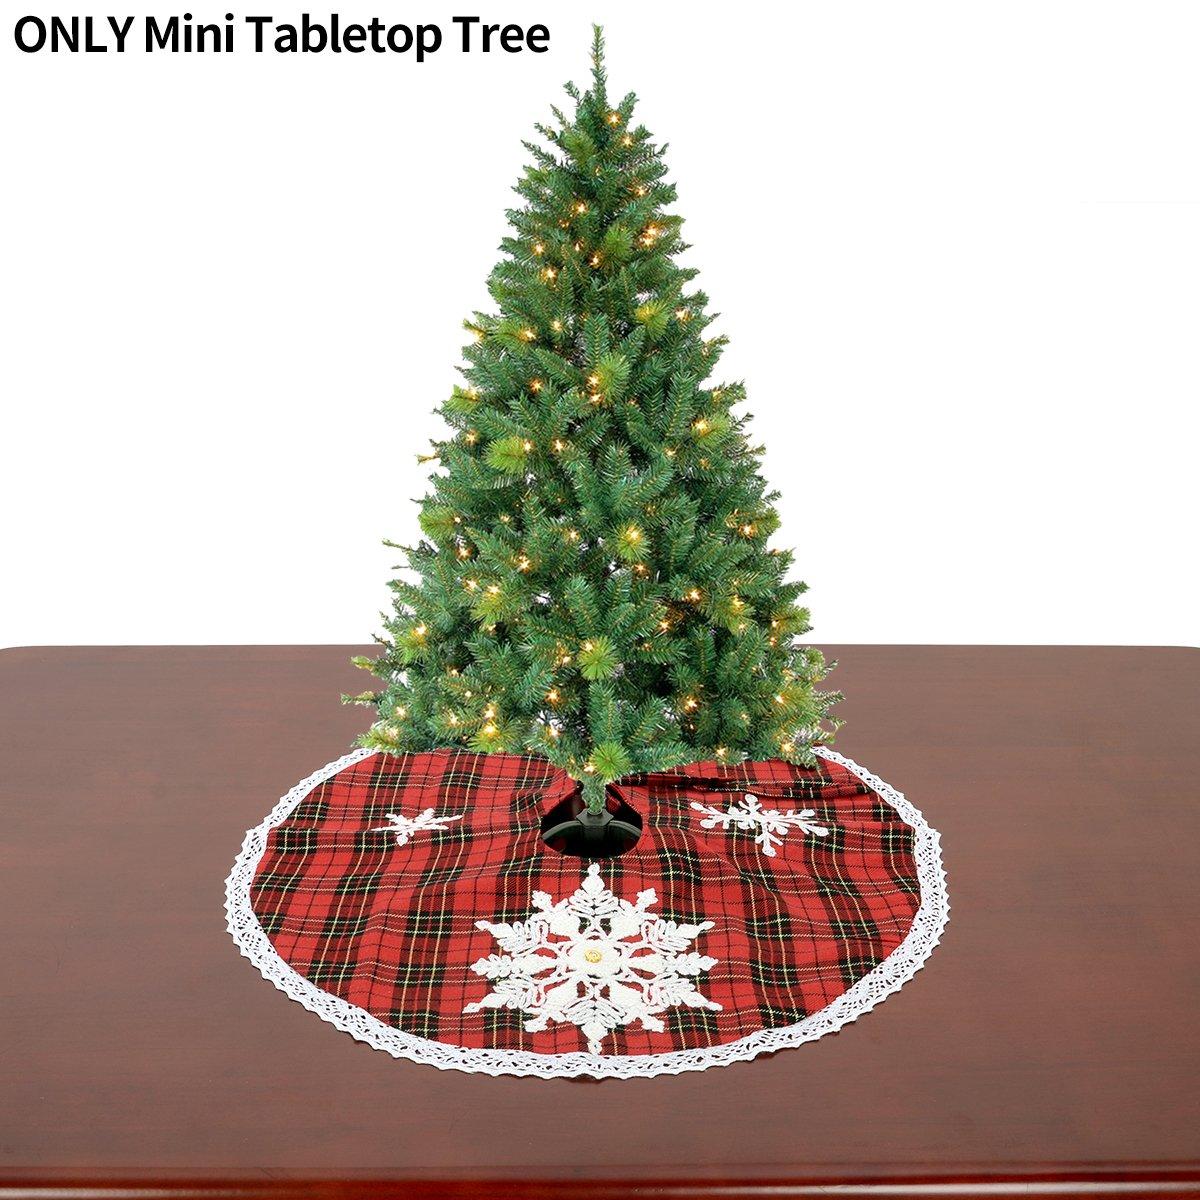 Amazon.com: Grelucgo Mini Christmas Tree Skirt For Small Tabletop ...